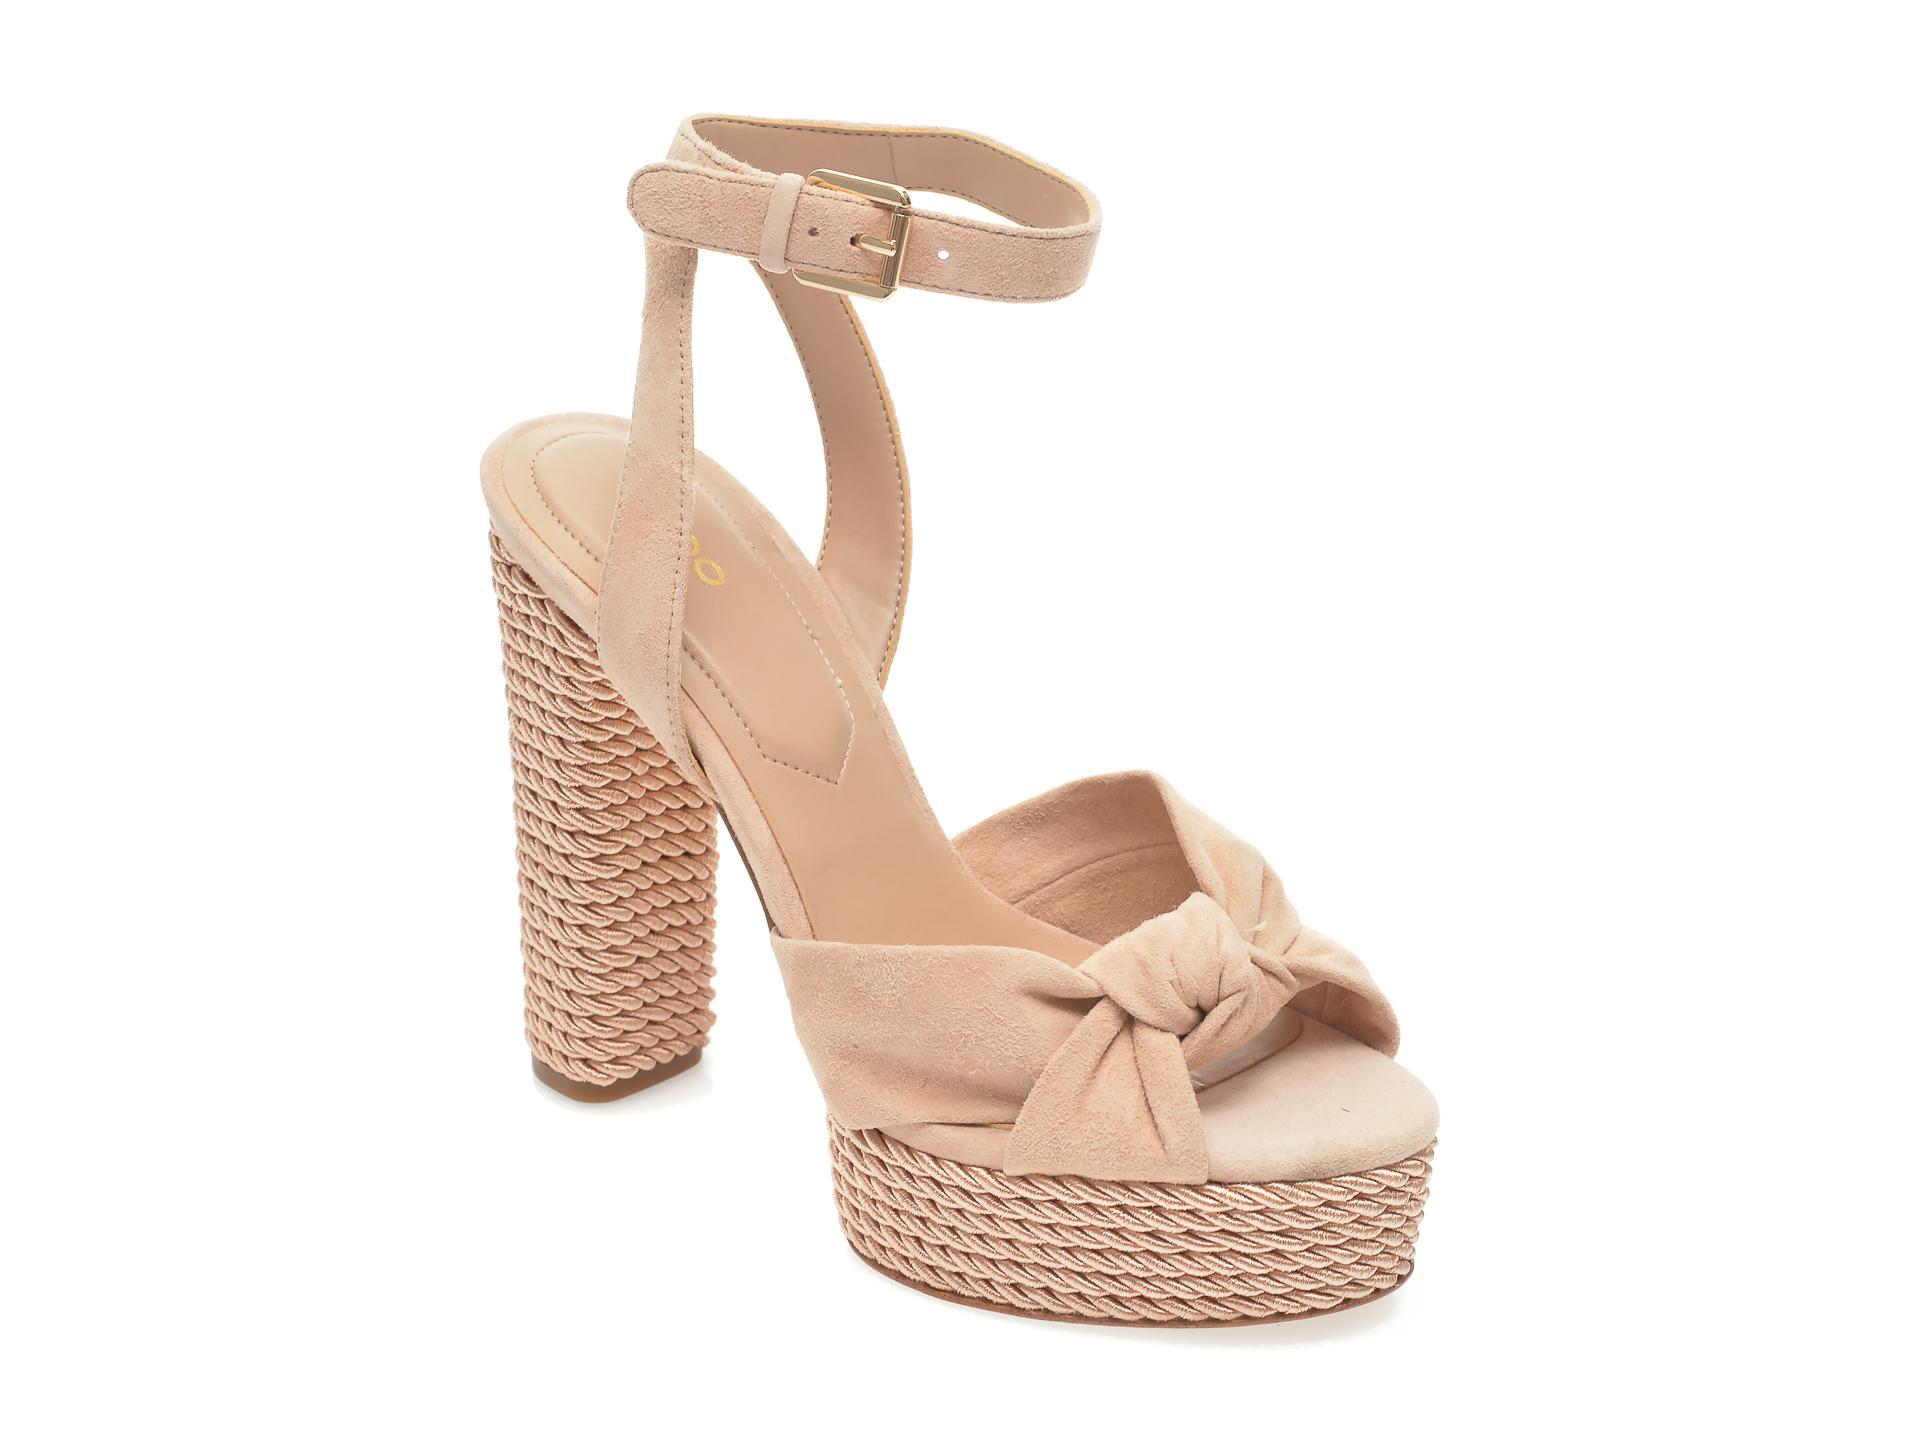 Sandale ALDO nude, Lauriers270, din piele intoarsa New